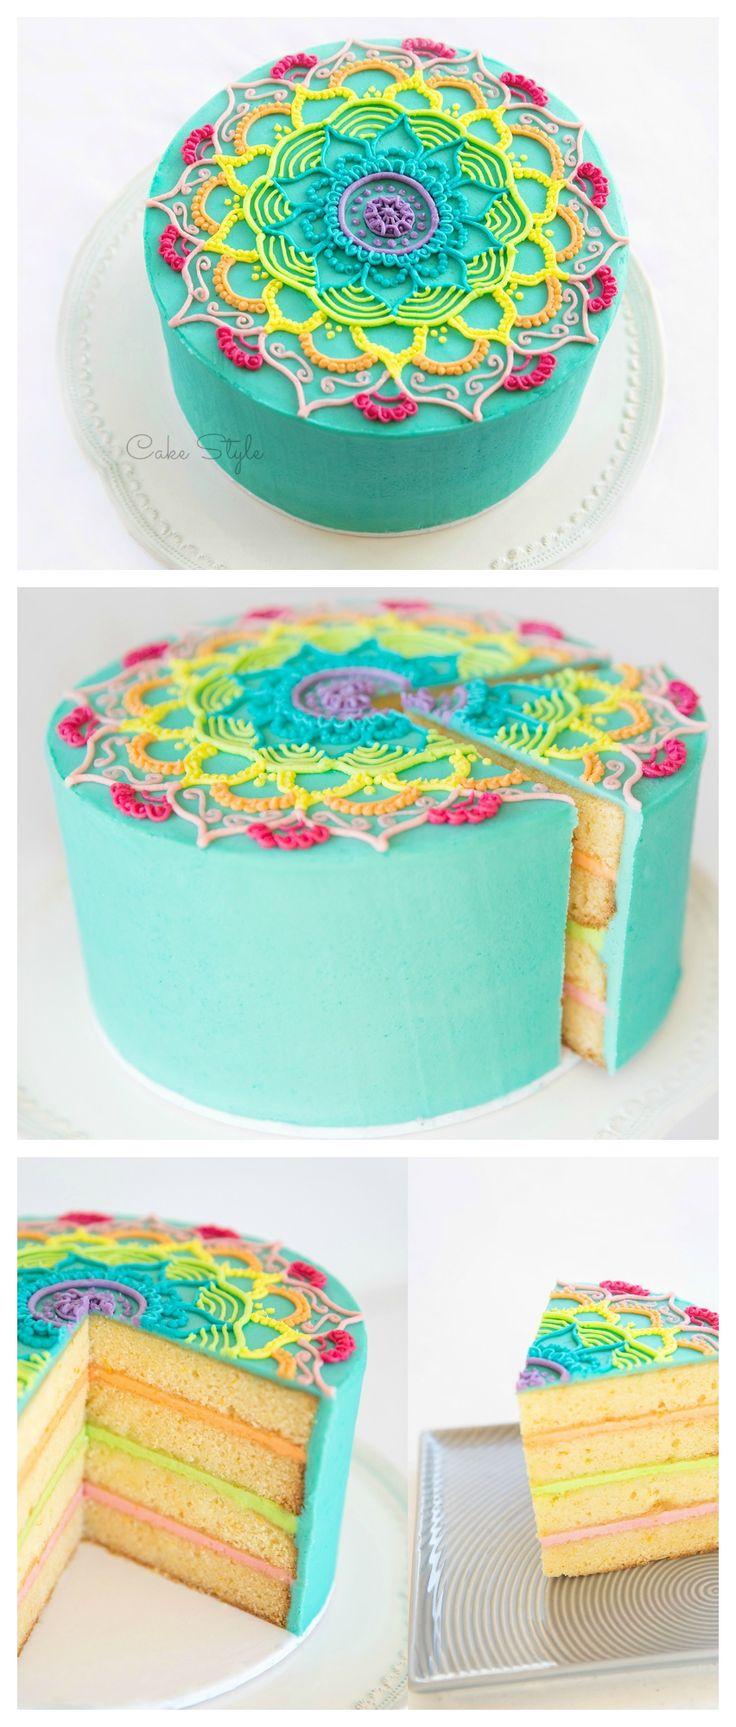 Mandala Cake. How amazing!! Video tutorial ~ https://youtu.be/cUuSL94f8jo